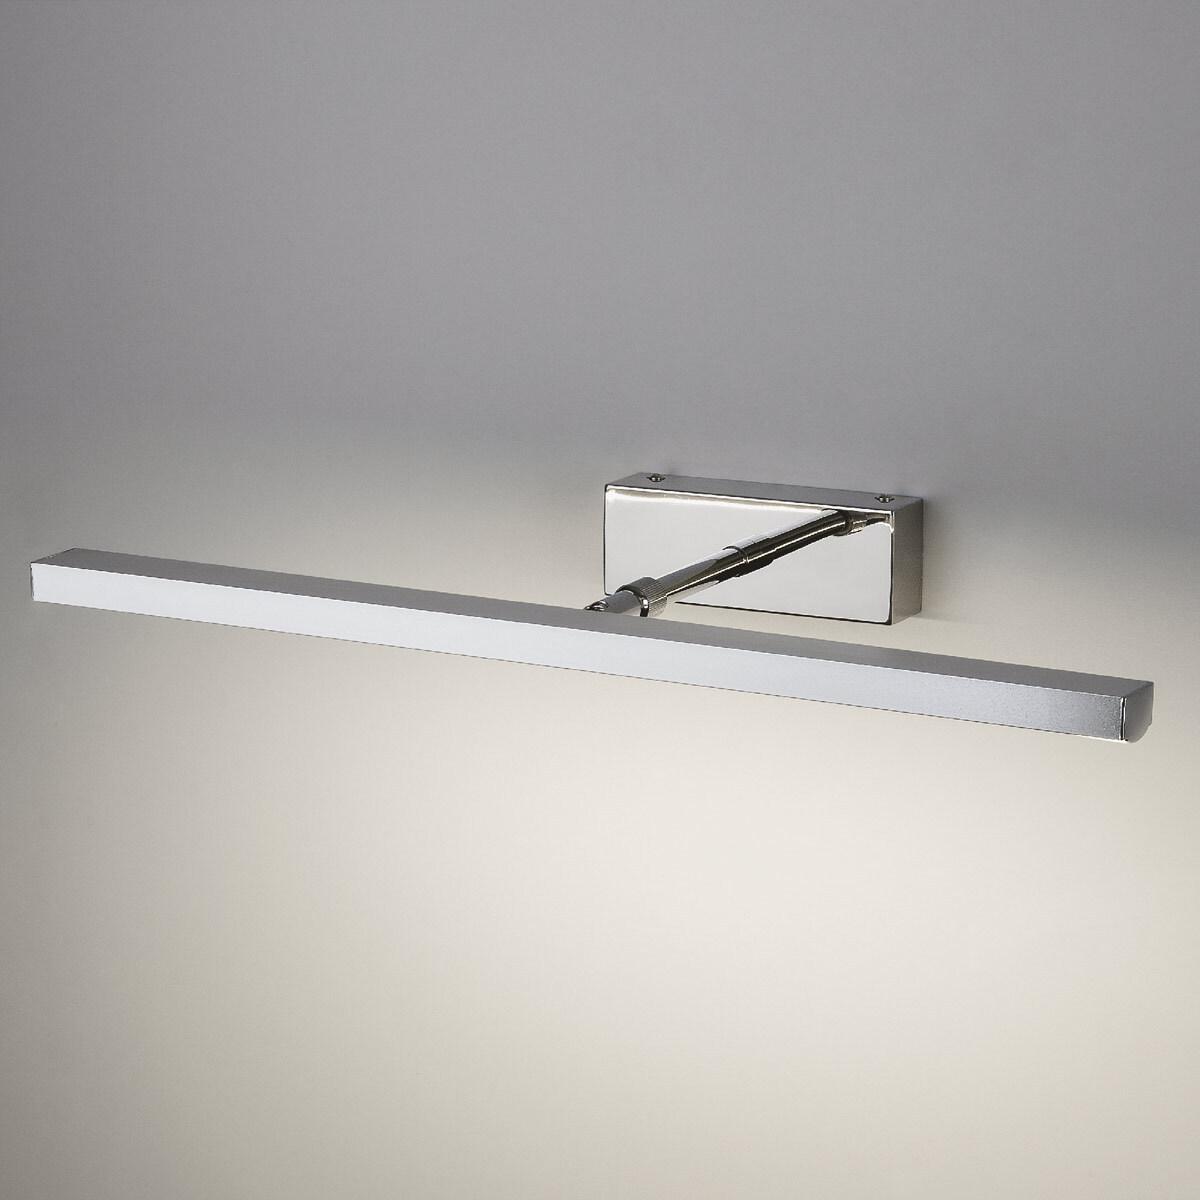 Настенный светильник Elektrostandard Cooper Neo LED светодиодный MRL LED 7W 1003 IP20, 7 Вт elektrostandard настенный светильник elektrostandard inside led белый матовый mrl led 12w